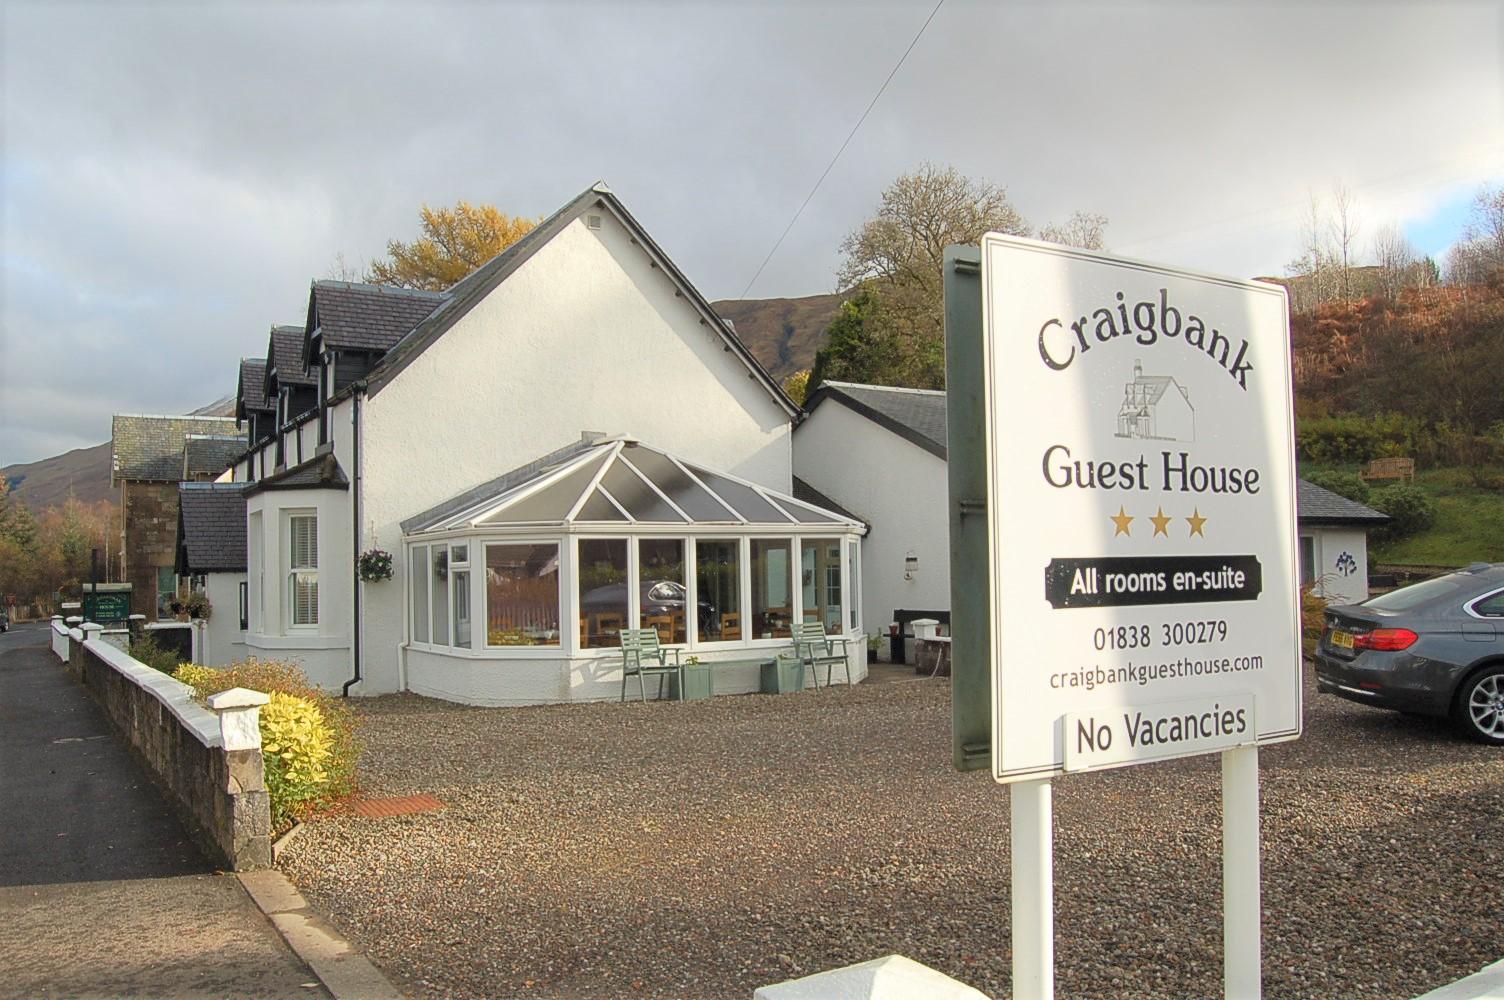 Craigbank Guest House.